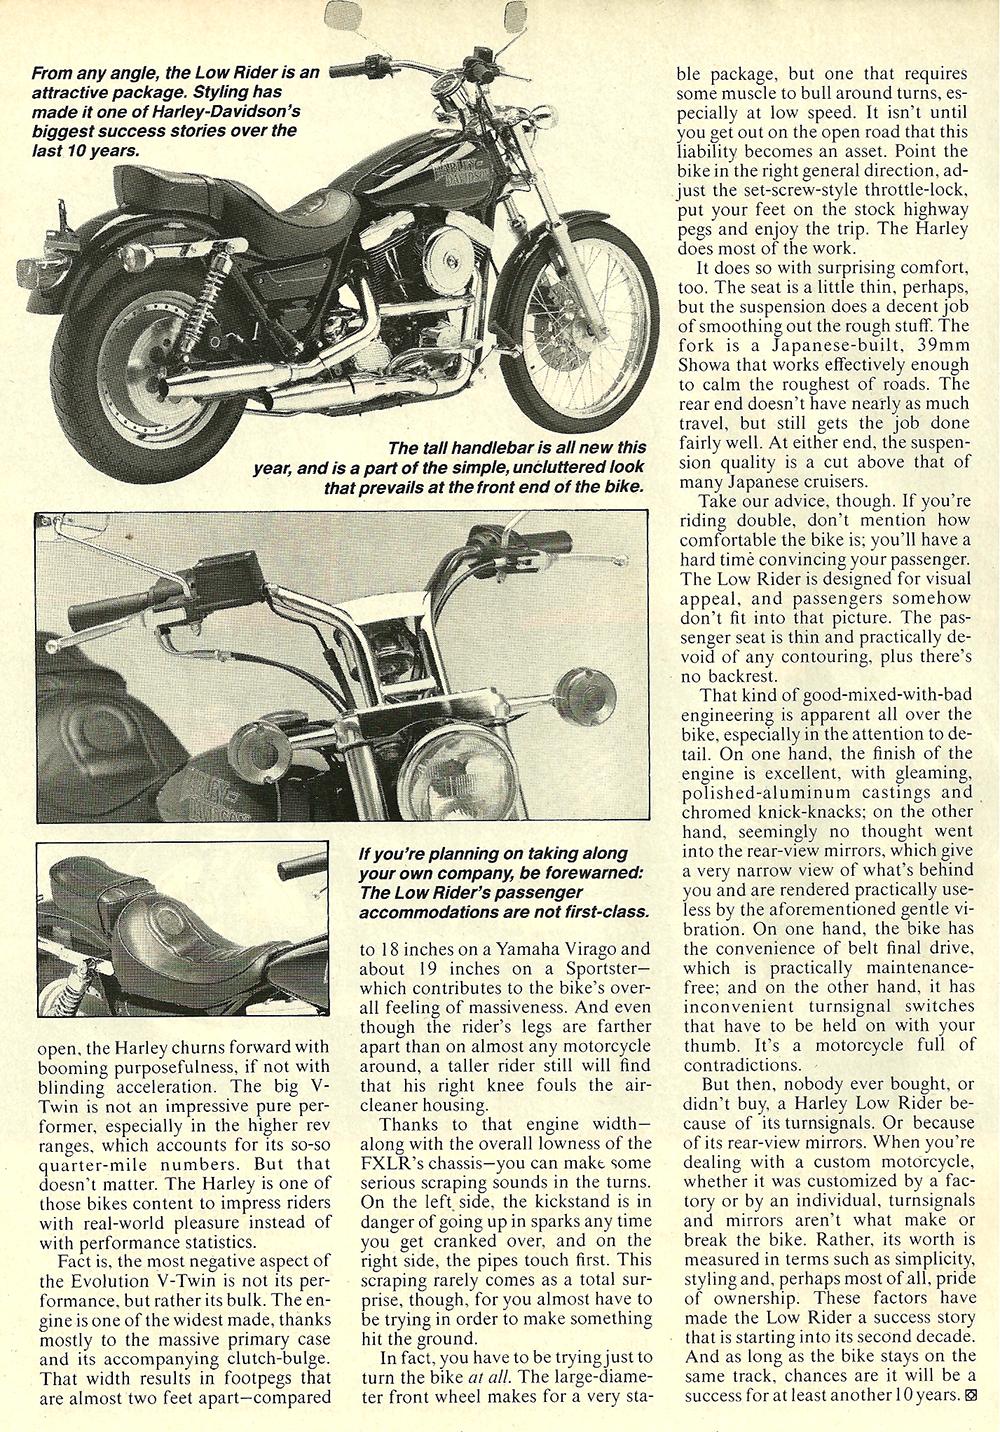 1987 Harley low rider custom fxlr road test 03.jpg